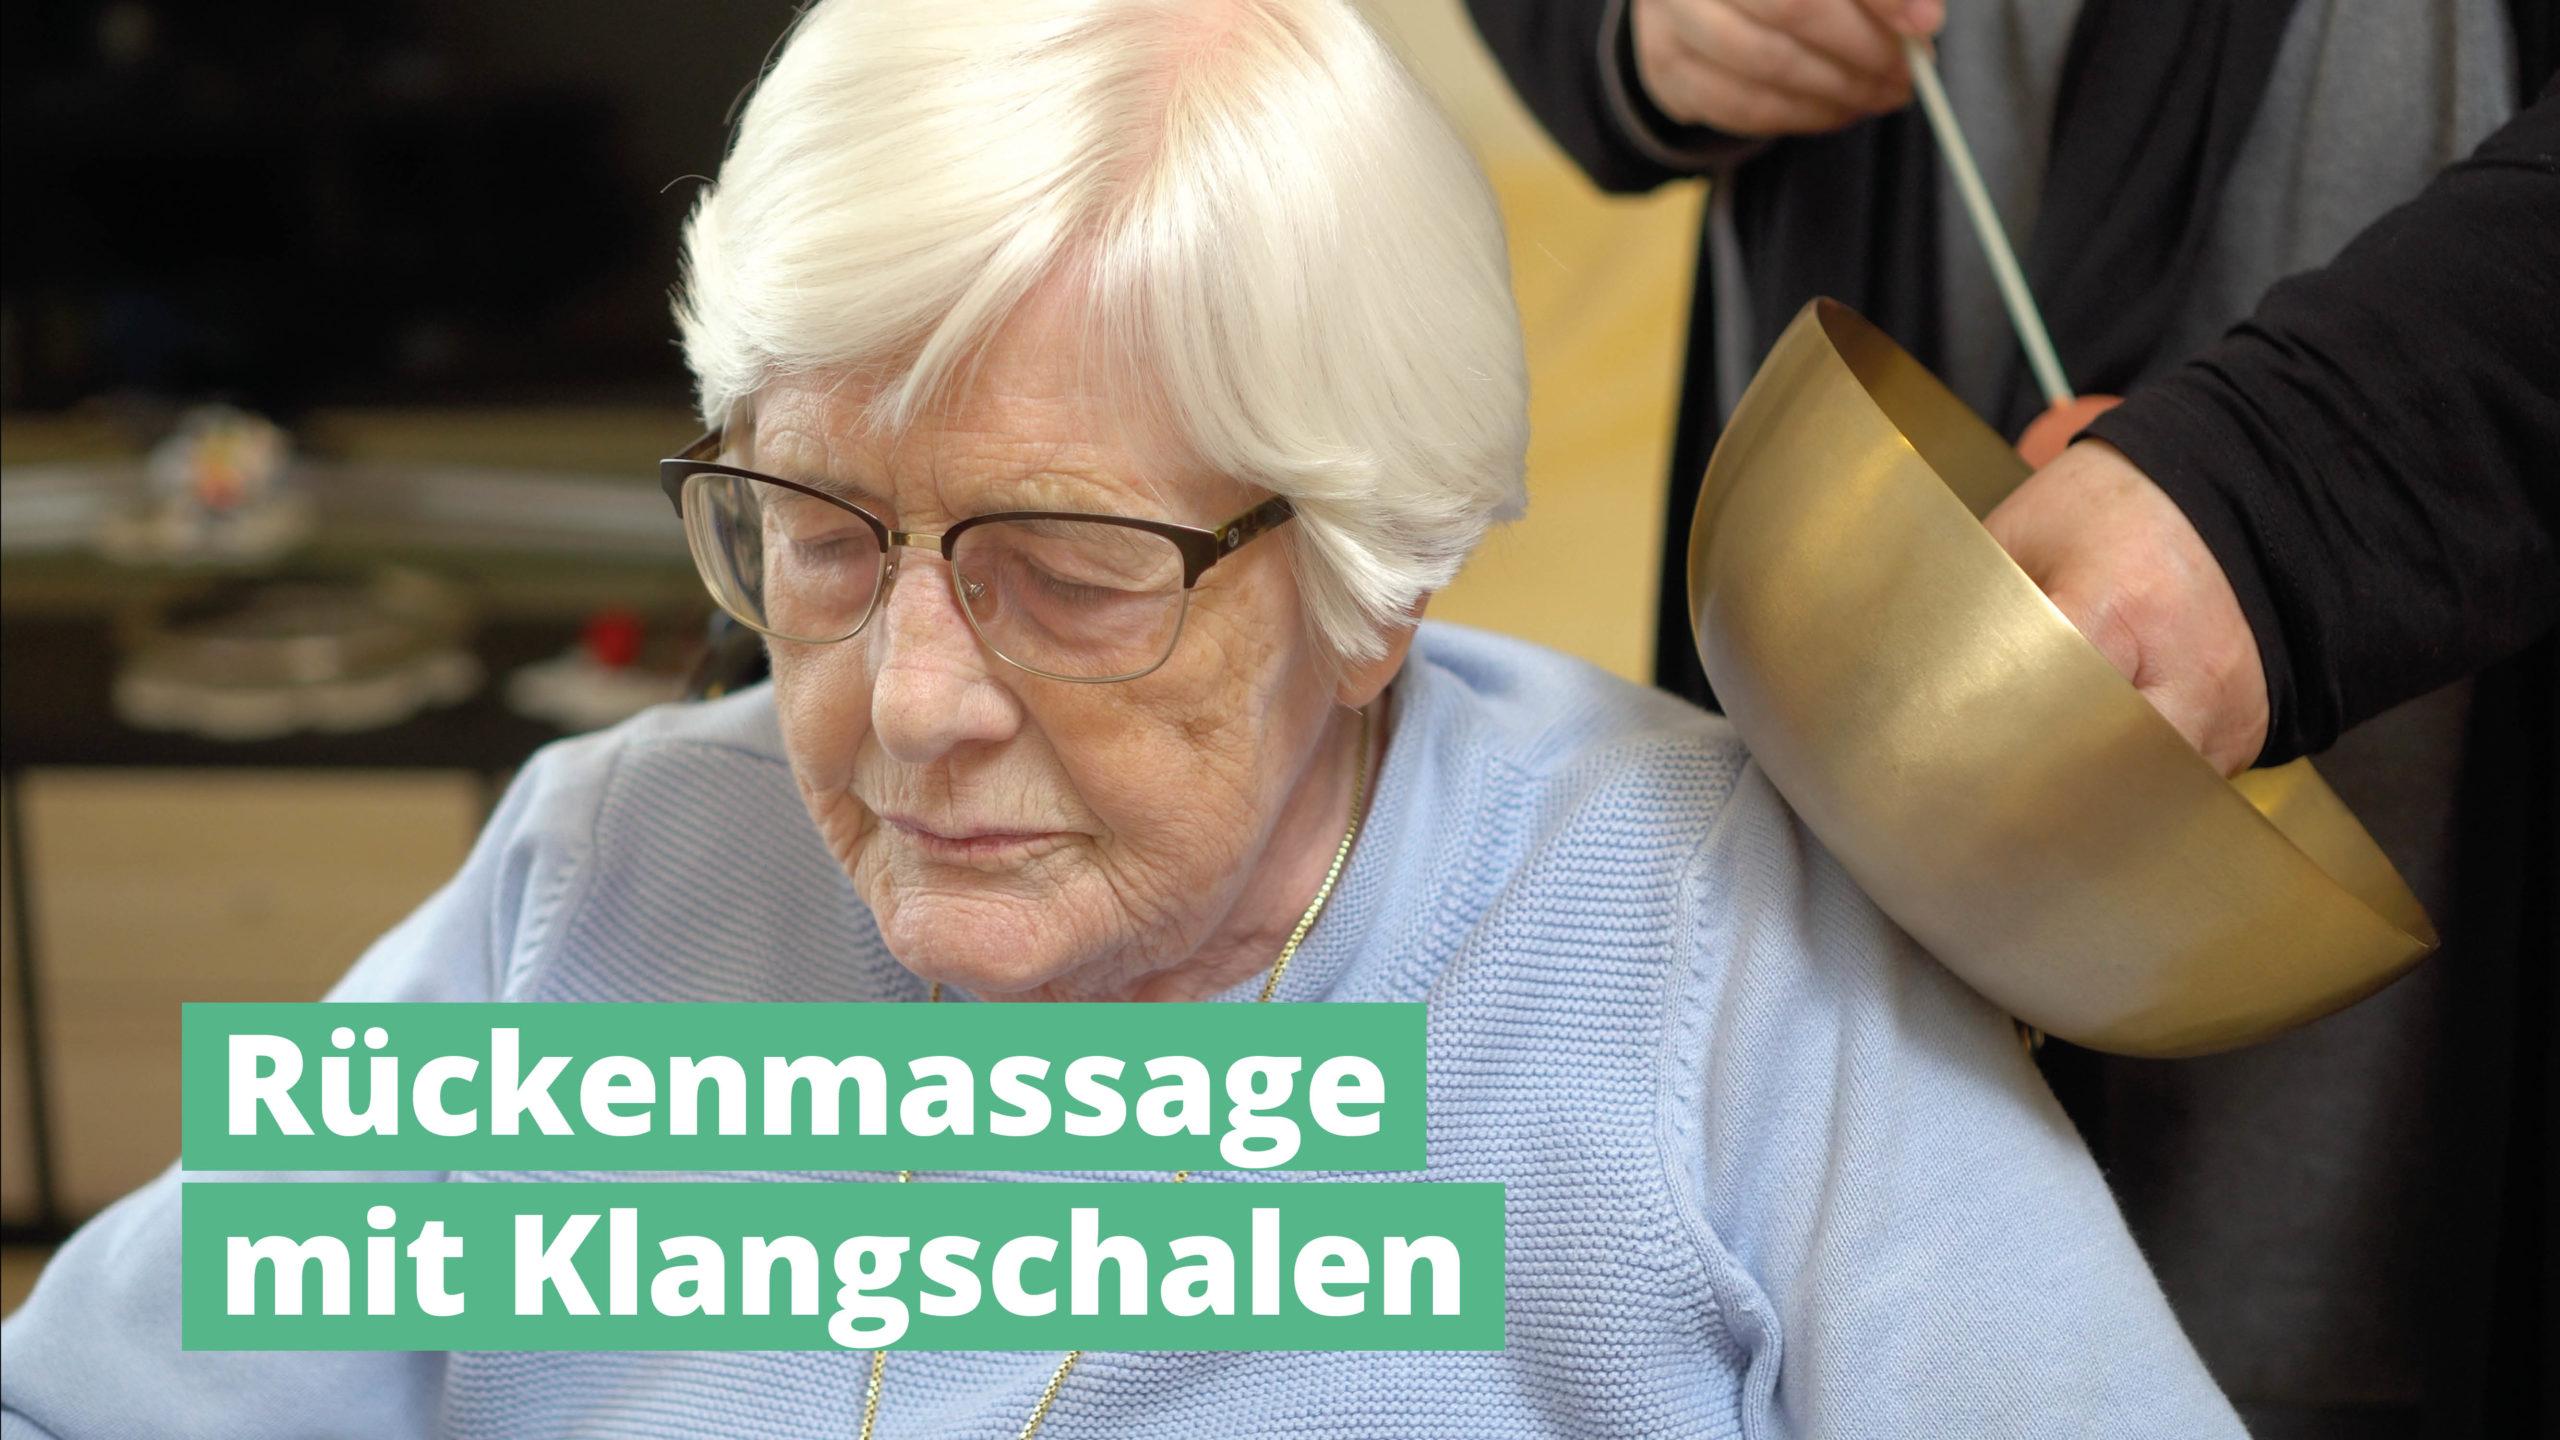 Rückenmassage mit PeterHess Klangschalen Wir Sind Altenpflege